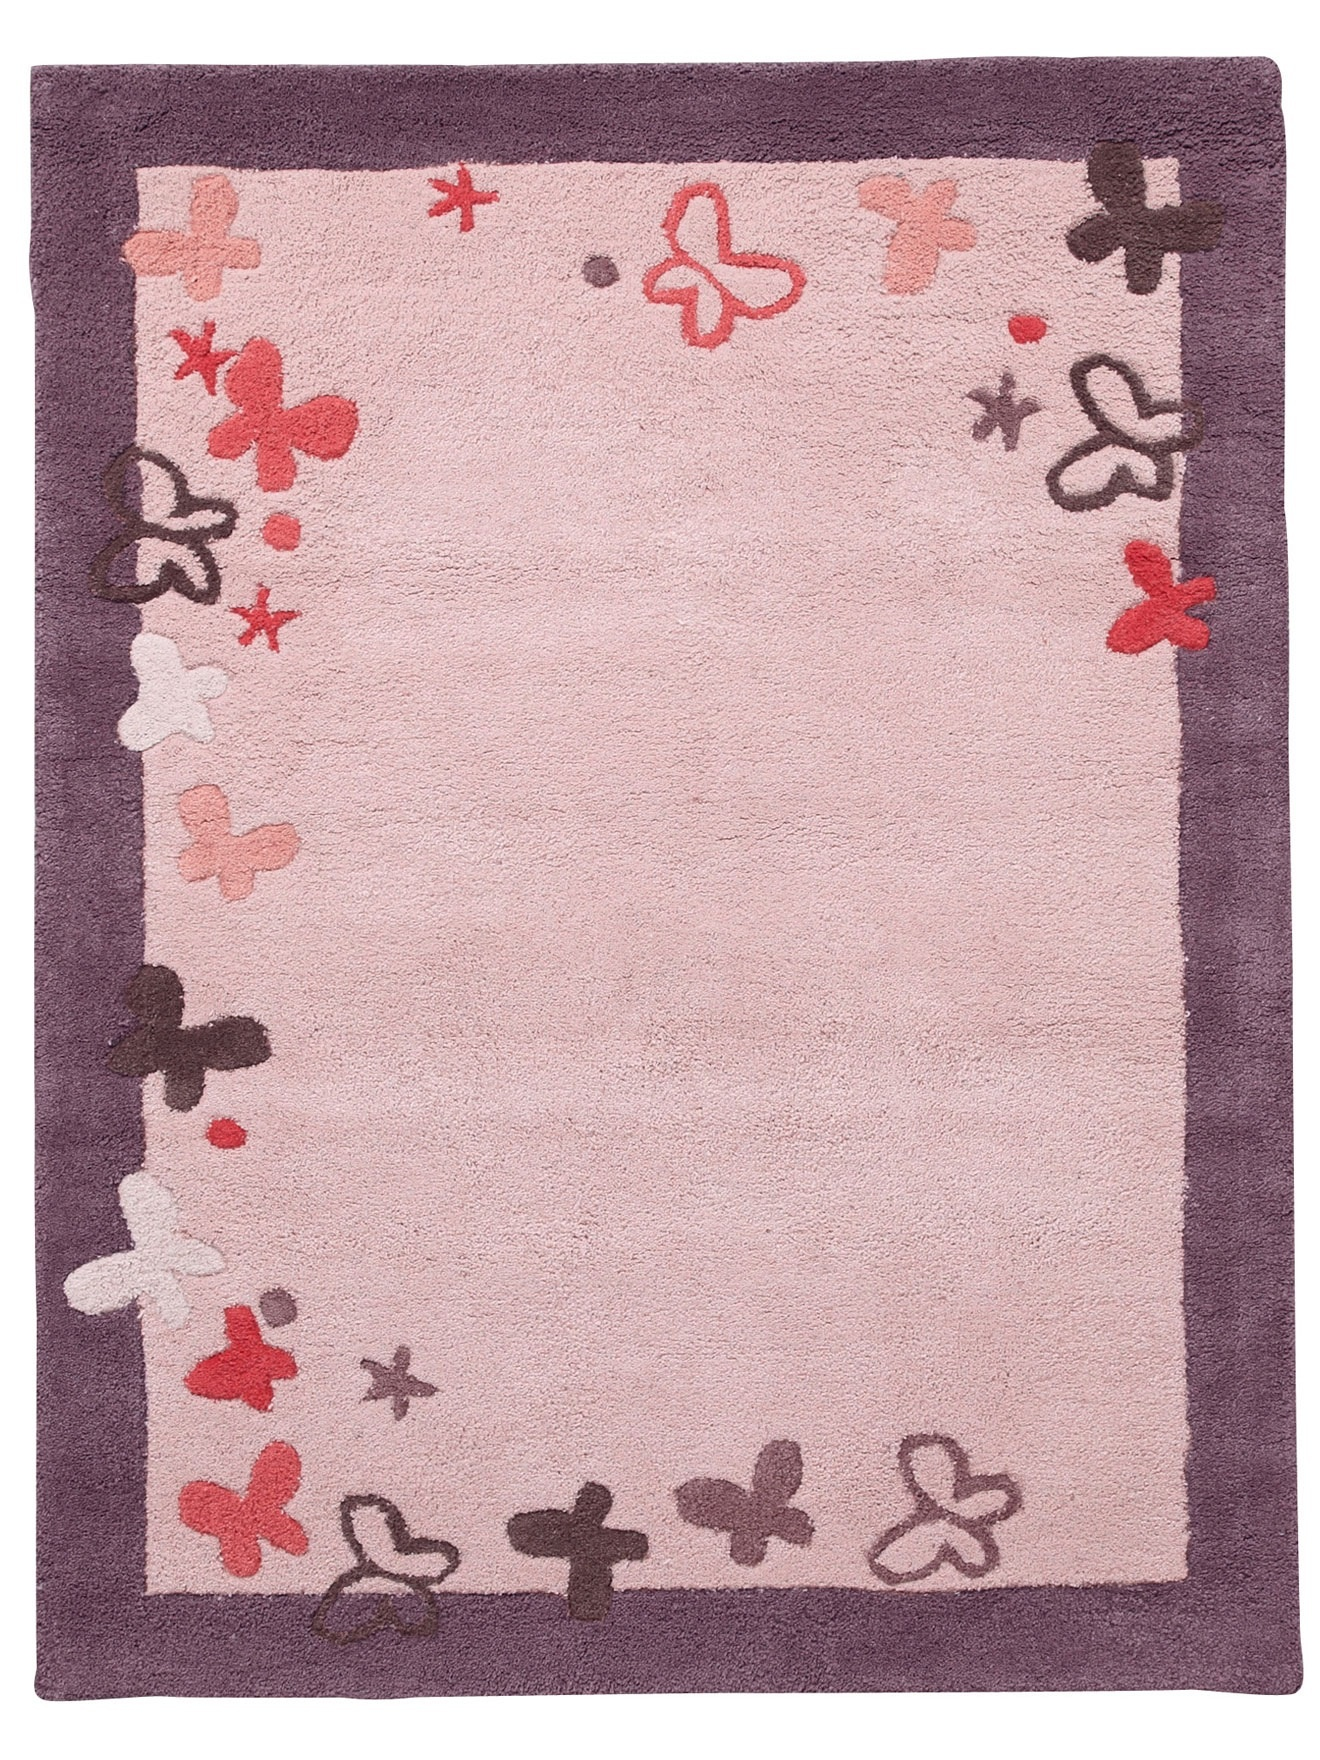 tapis rose fushia pas cher awesome carrelage design soldes tapis ikea tapis grand moduele tapis. Black Bedroom Furniture Sets. Home Design Ideas